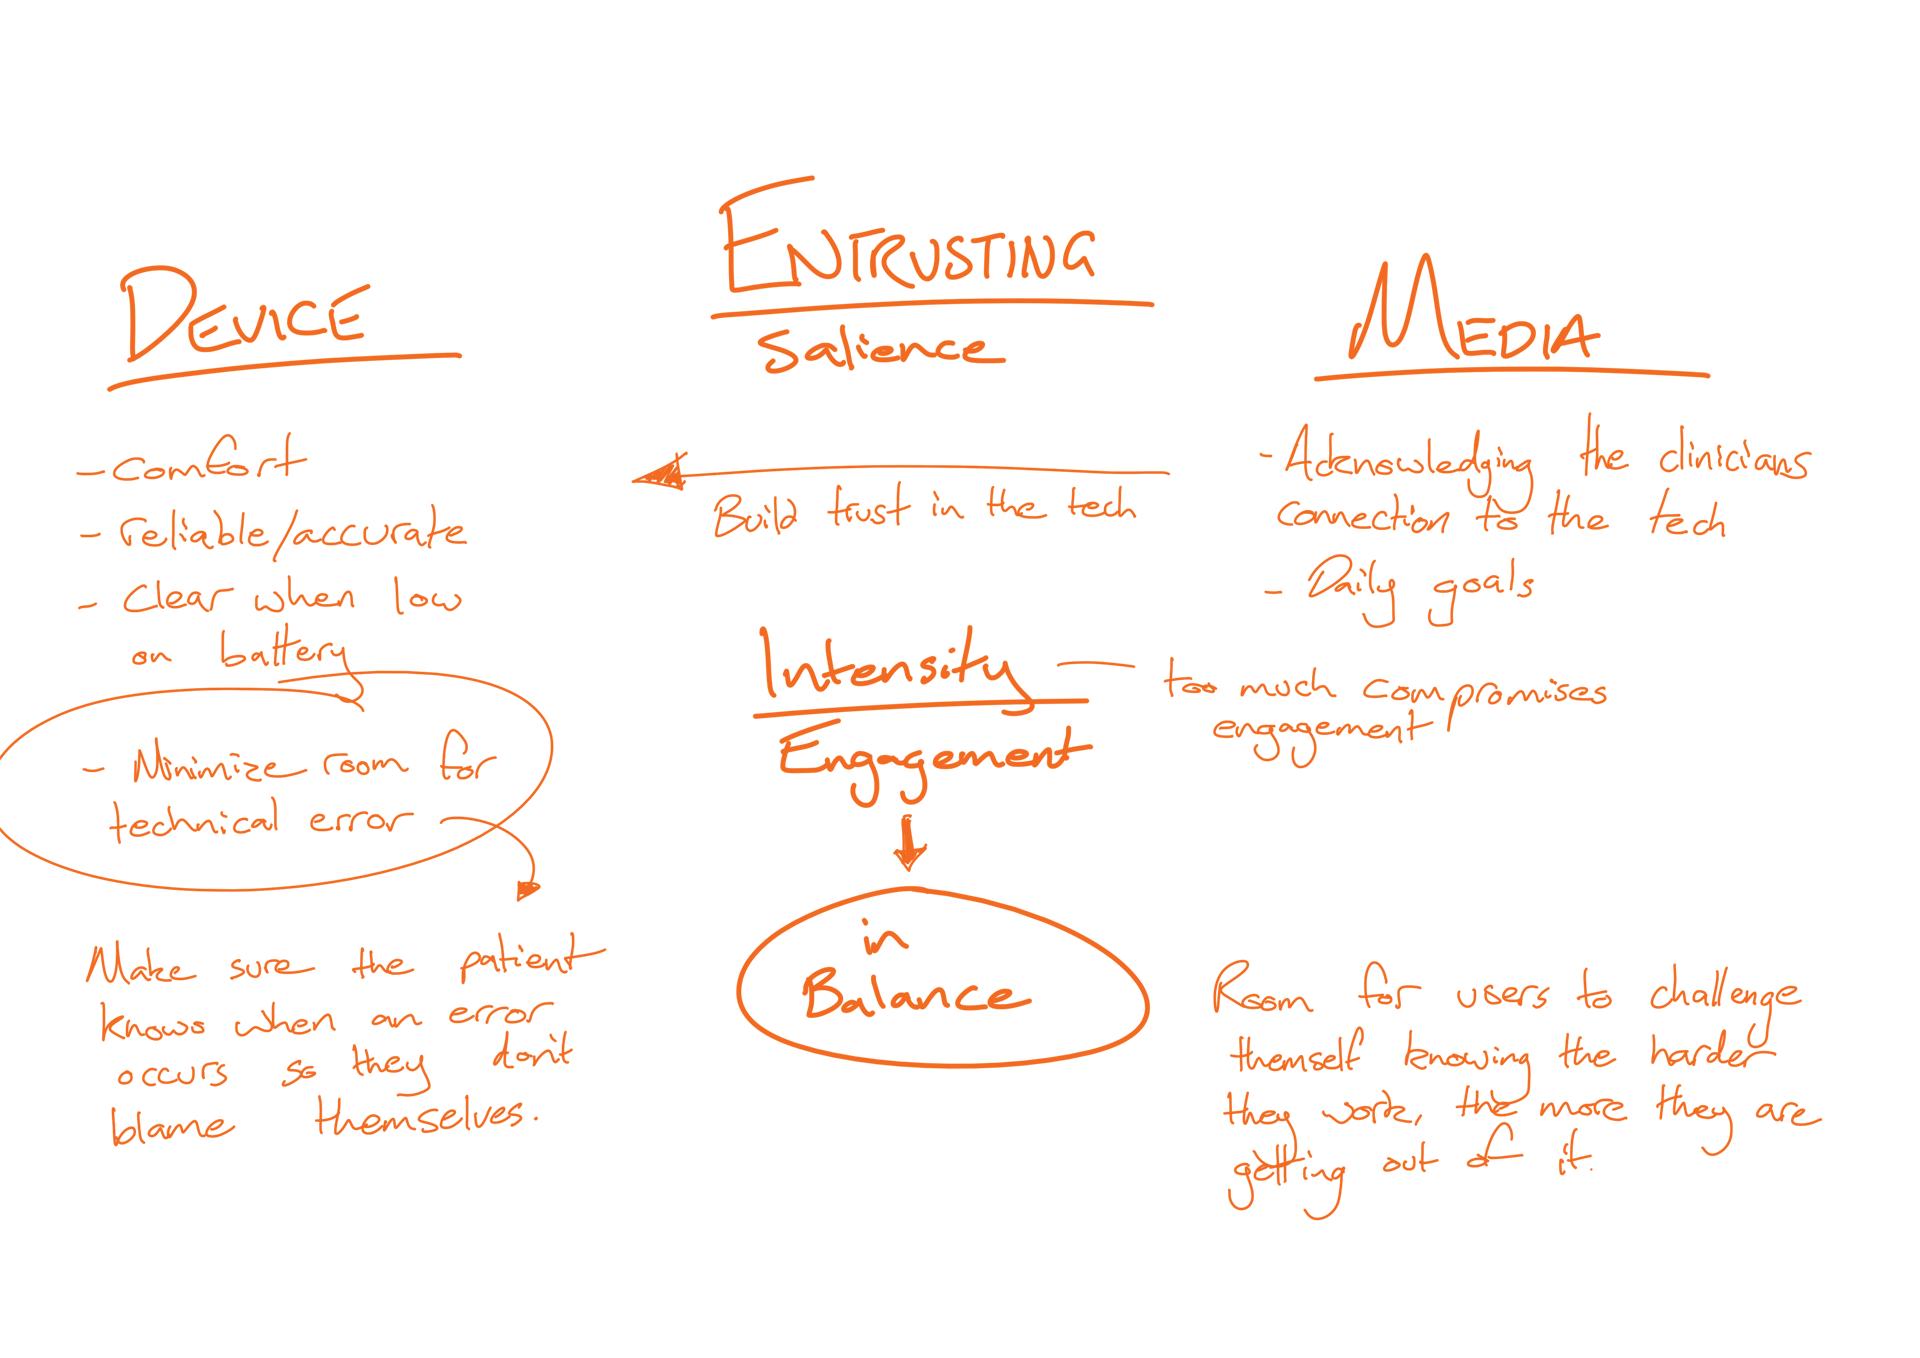 Figure 4.3 - Entrusting